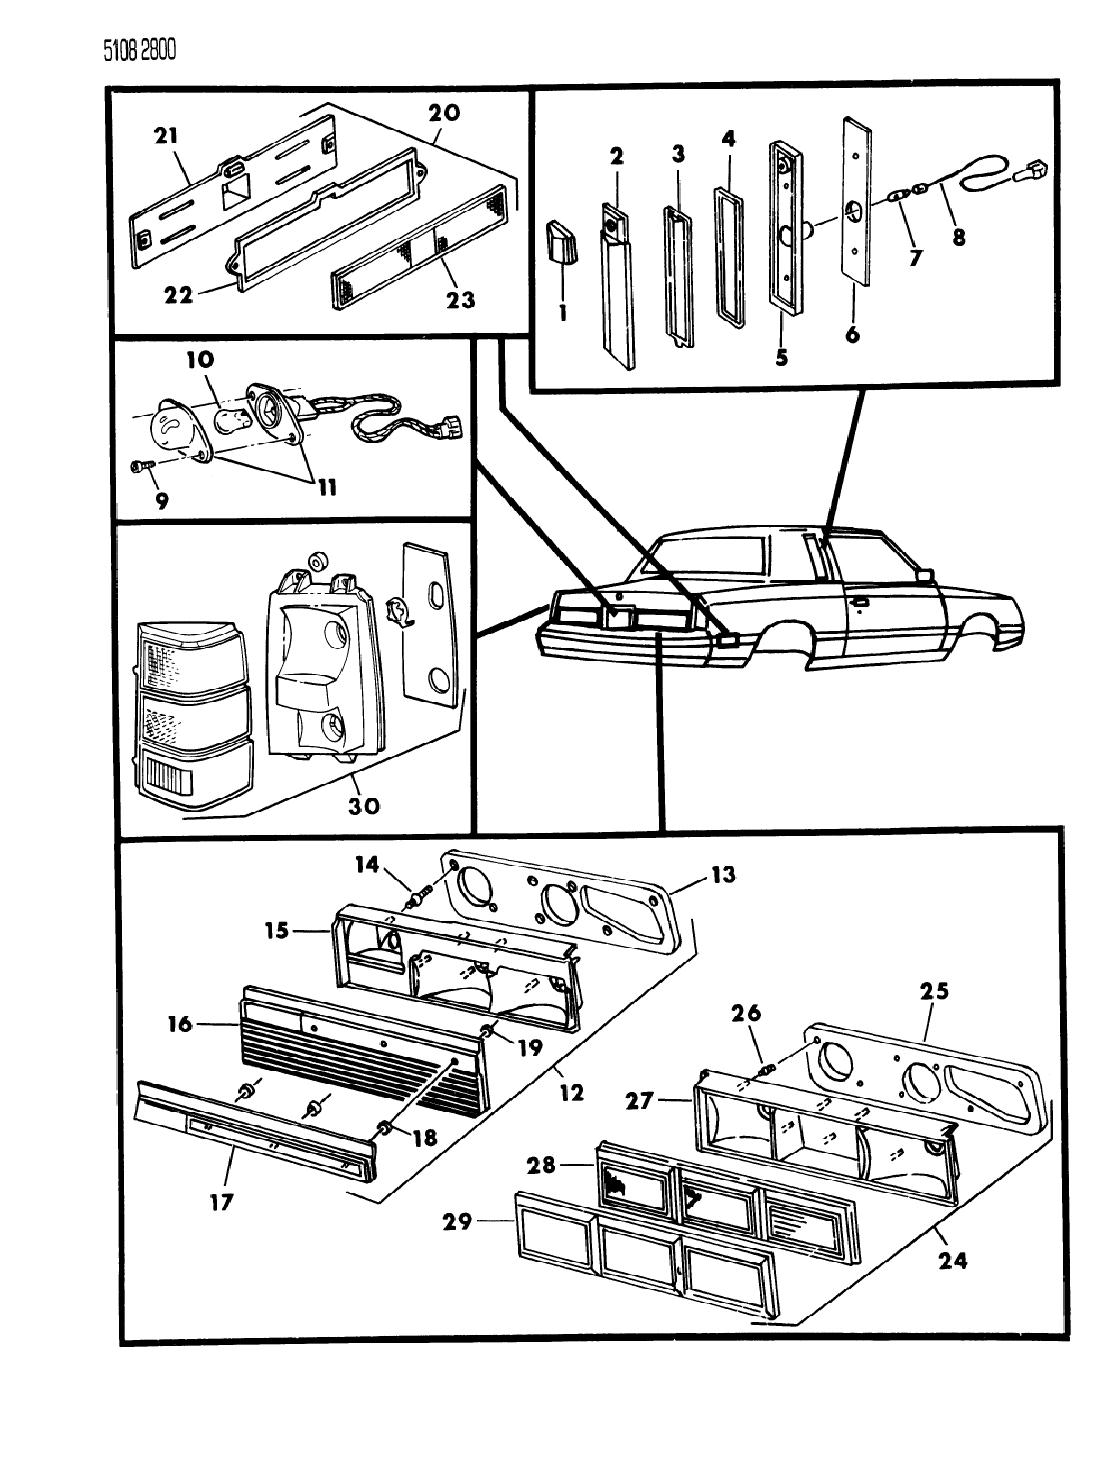 1985 Chrysler Laser Lamps & Wiring - Rear - Mopar Parts Giant